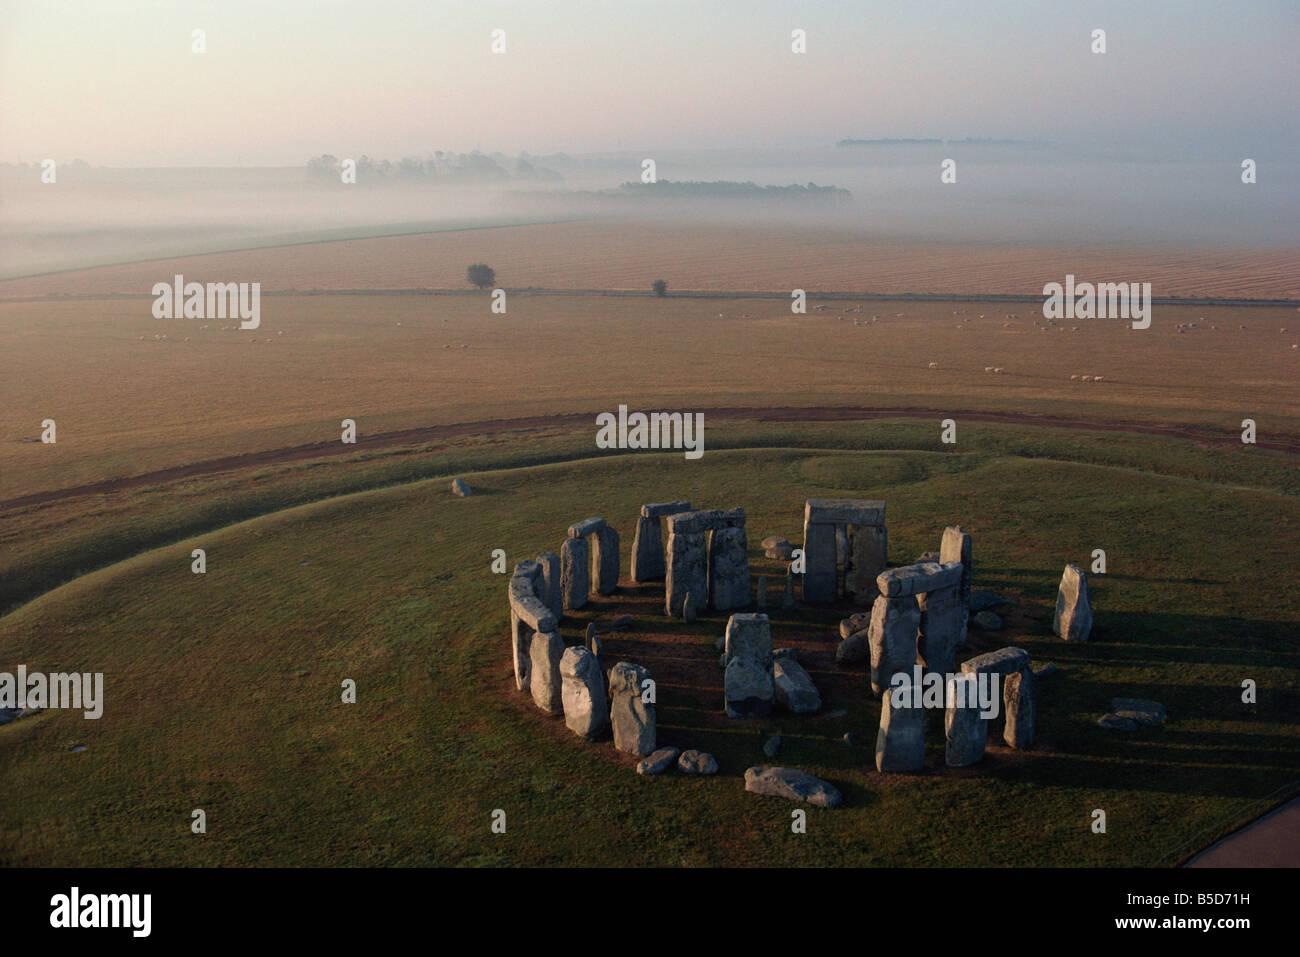 Aerial view of Stonehenge, UNESCO World Heritage Site, Wiltshire, England, Europe Stock Photo